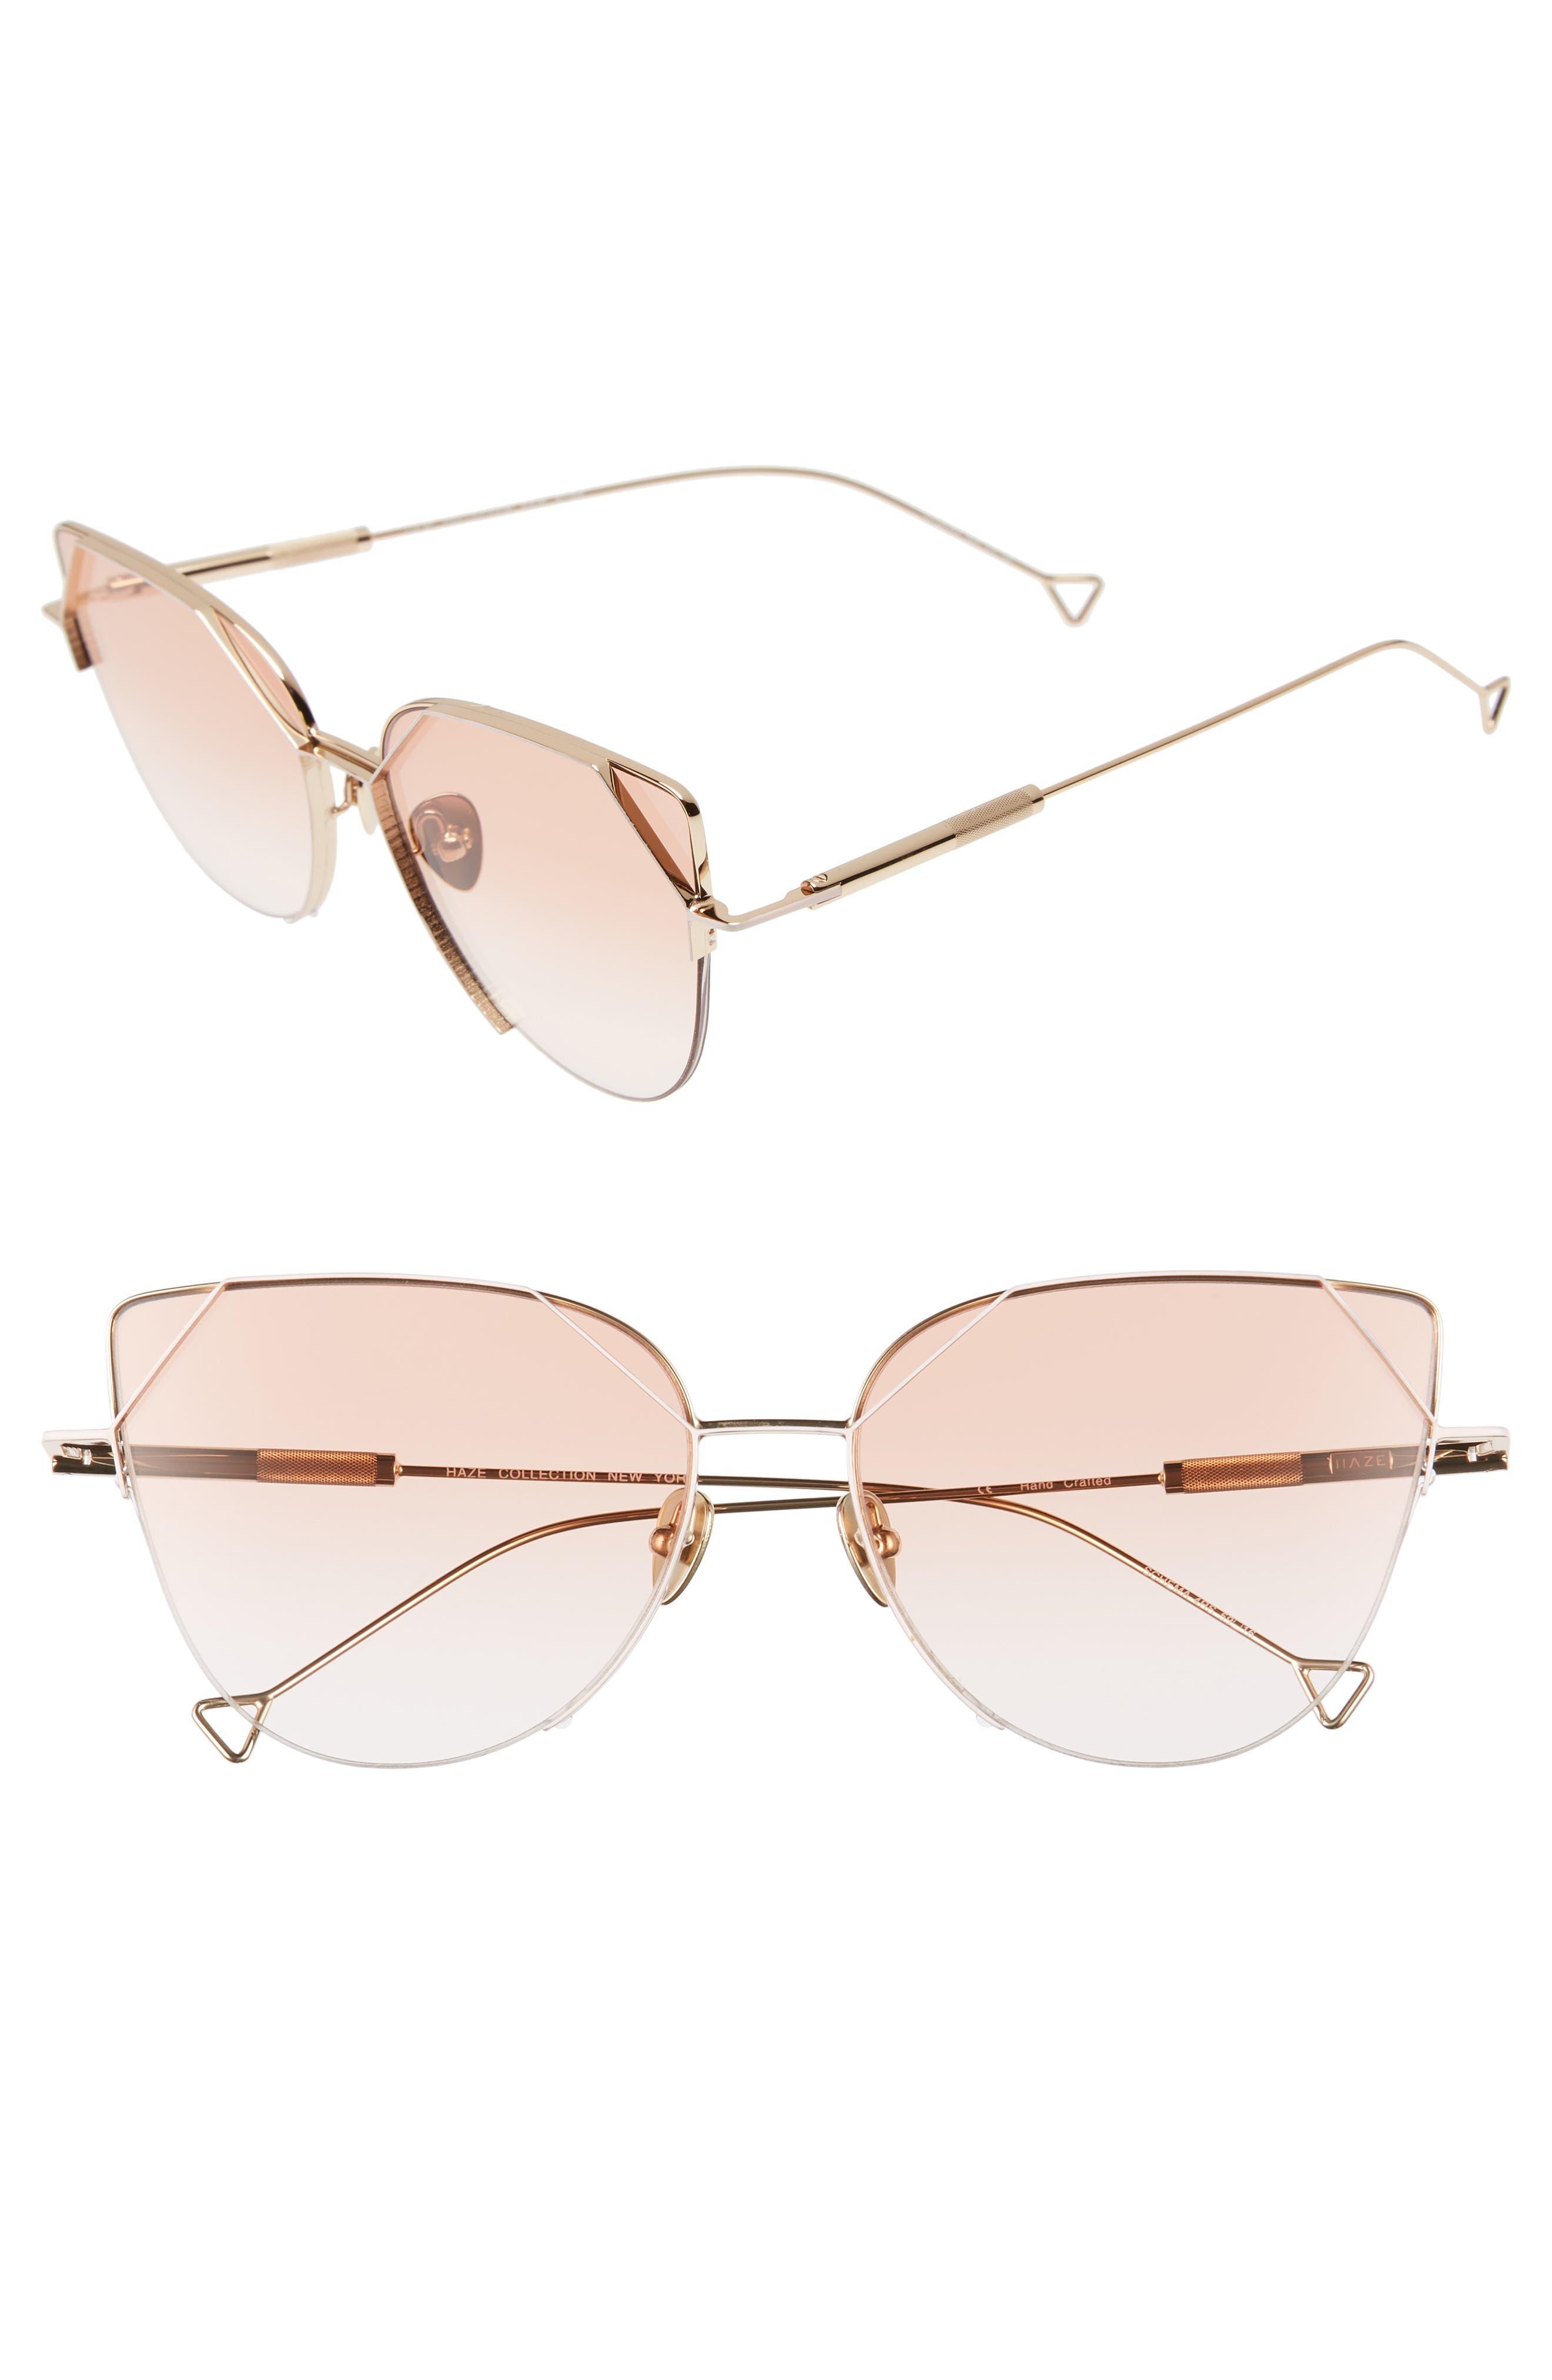 HAZE The Schema 59mm Cat Eye Sunglasses, Main, color, NUDE